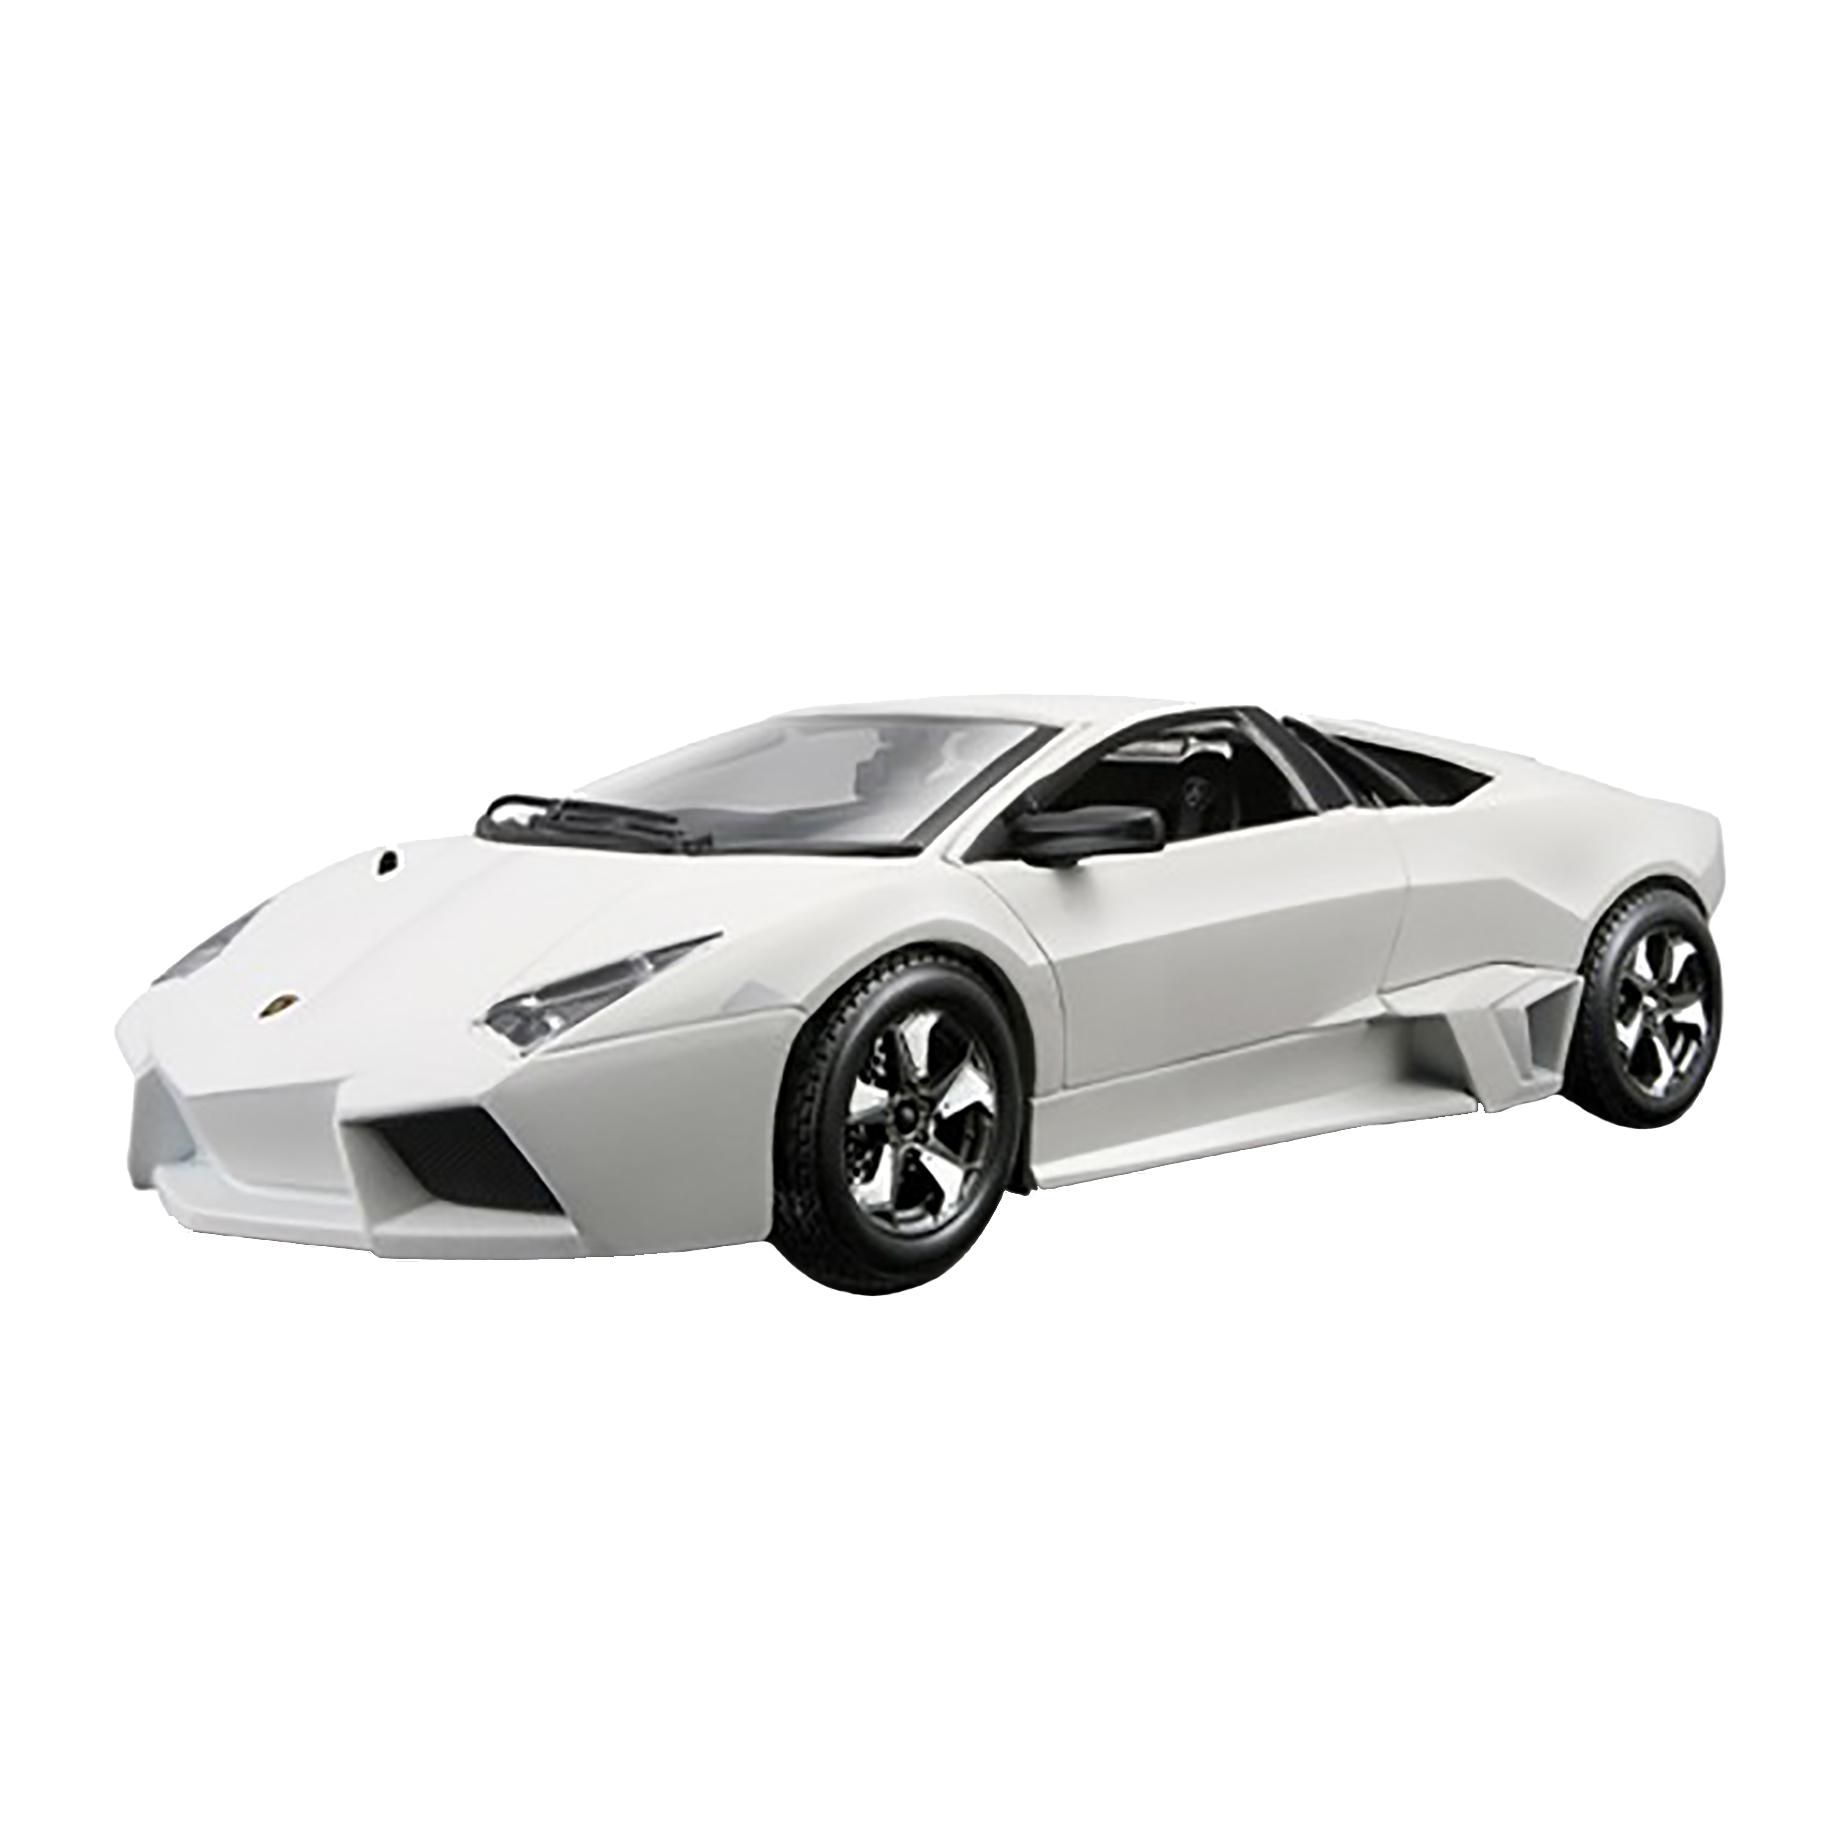 bburago Автомобиль Lamborghini Reventon (матовый белый), 1:24, Bburago (18-21041)